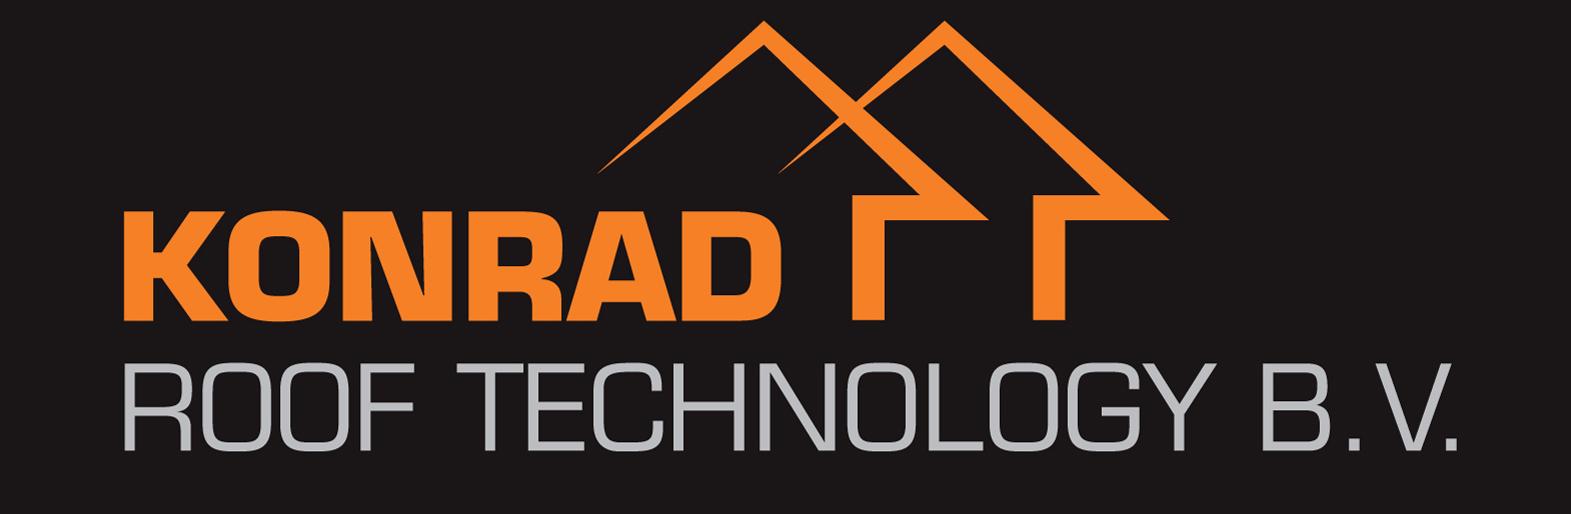 Konrad Roof Technology